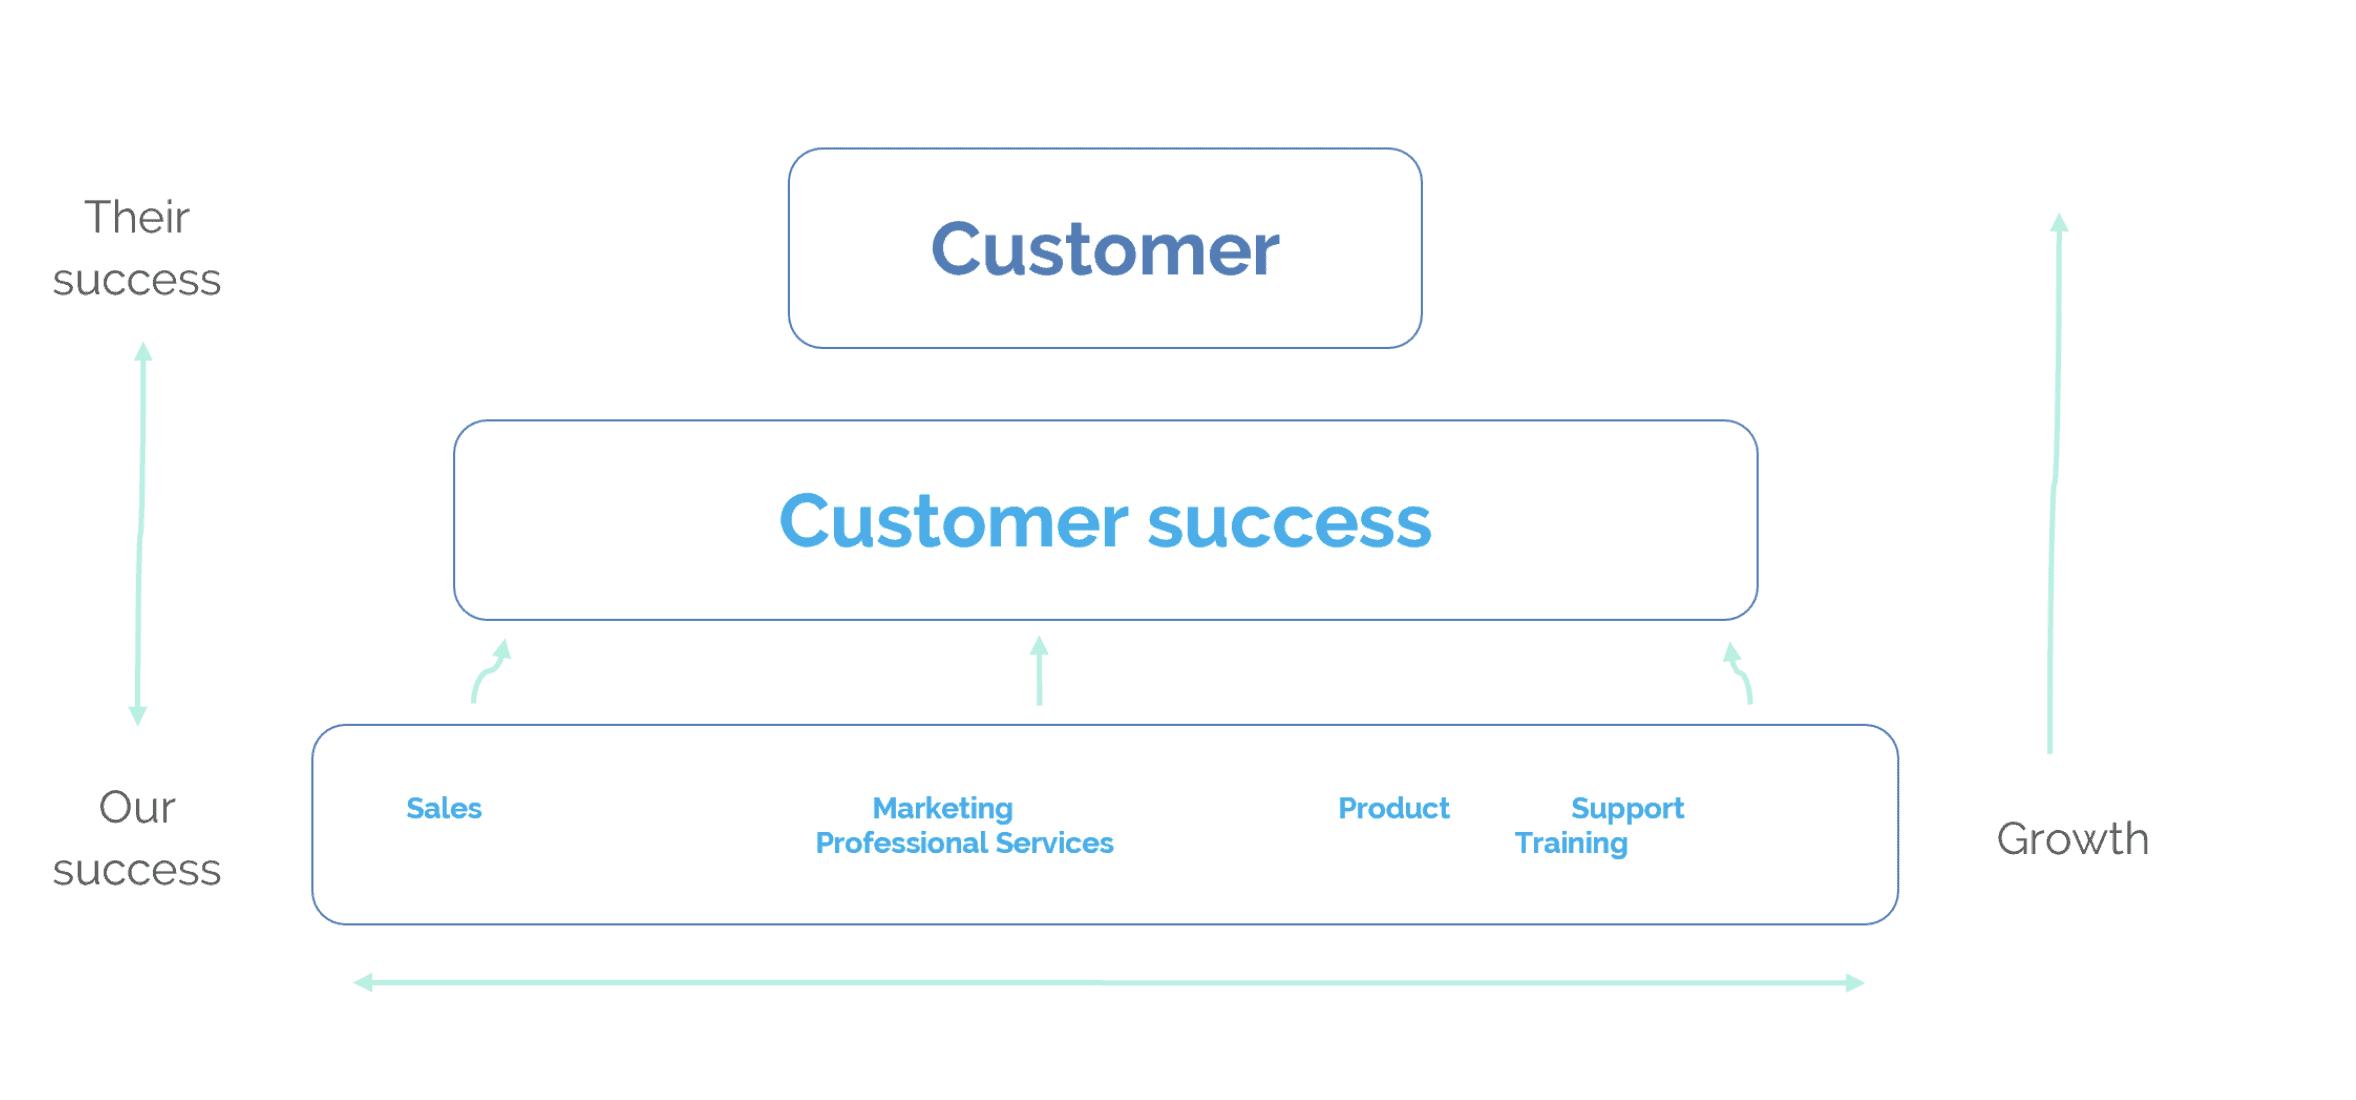 Customer Success within an organisation